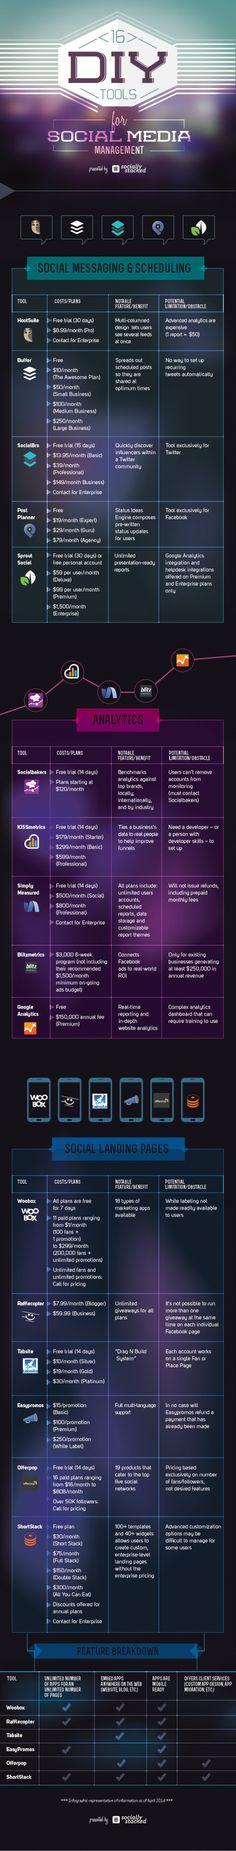 16 Tools for Social Media management #infografia #infographic #socialmedia